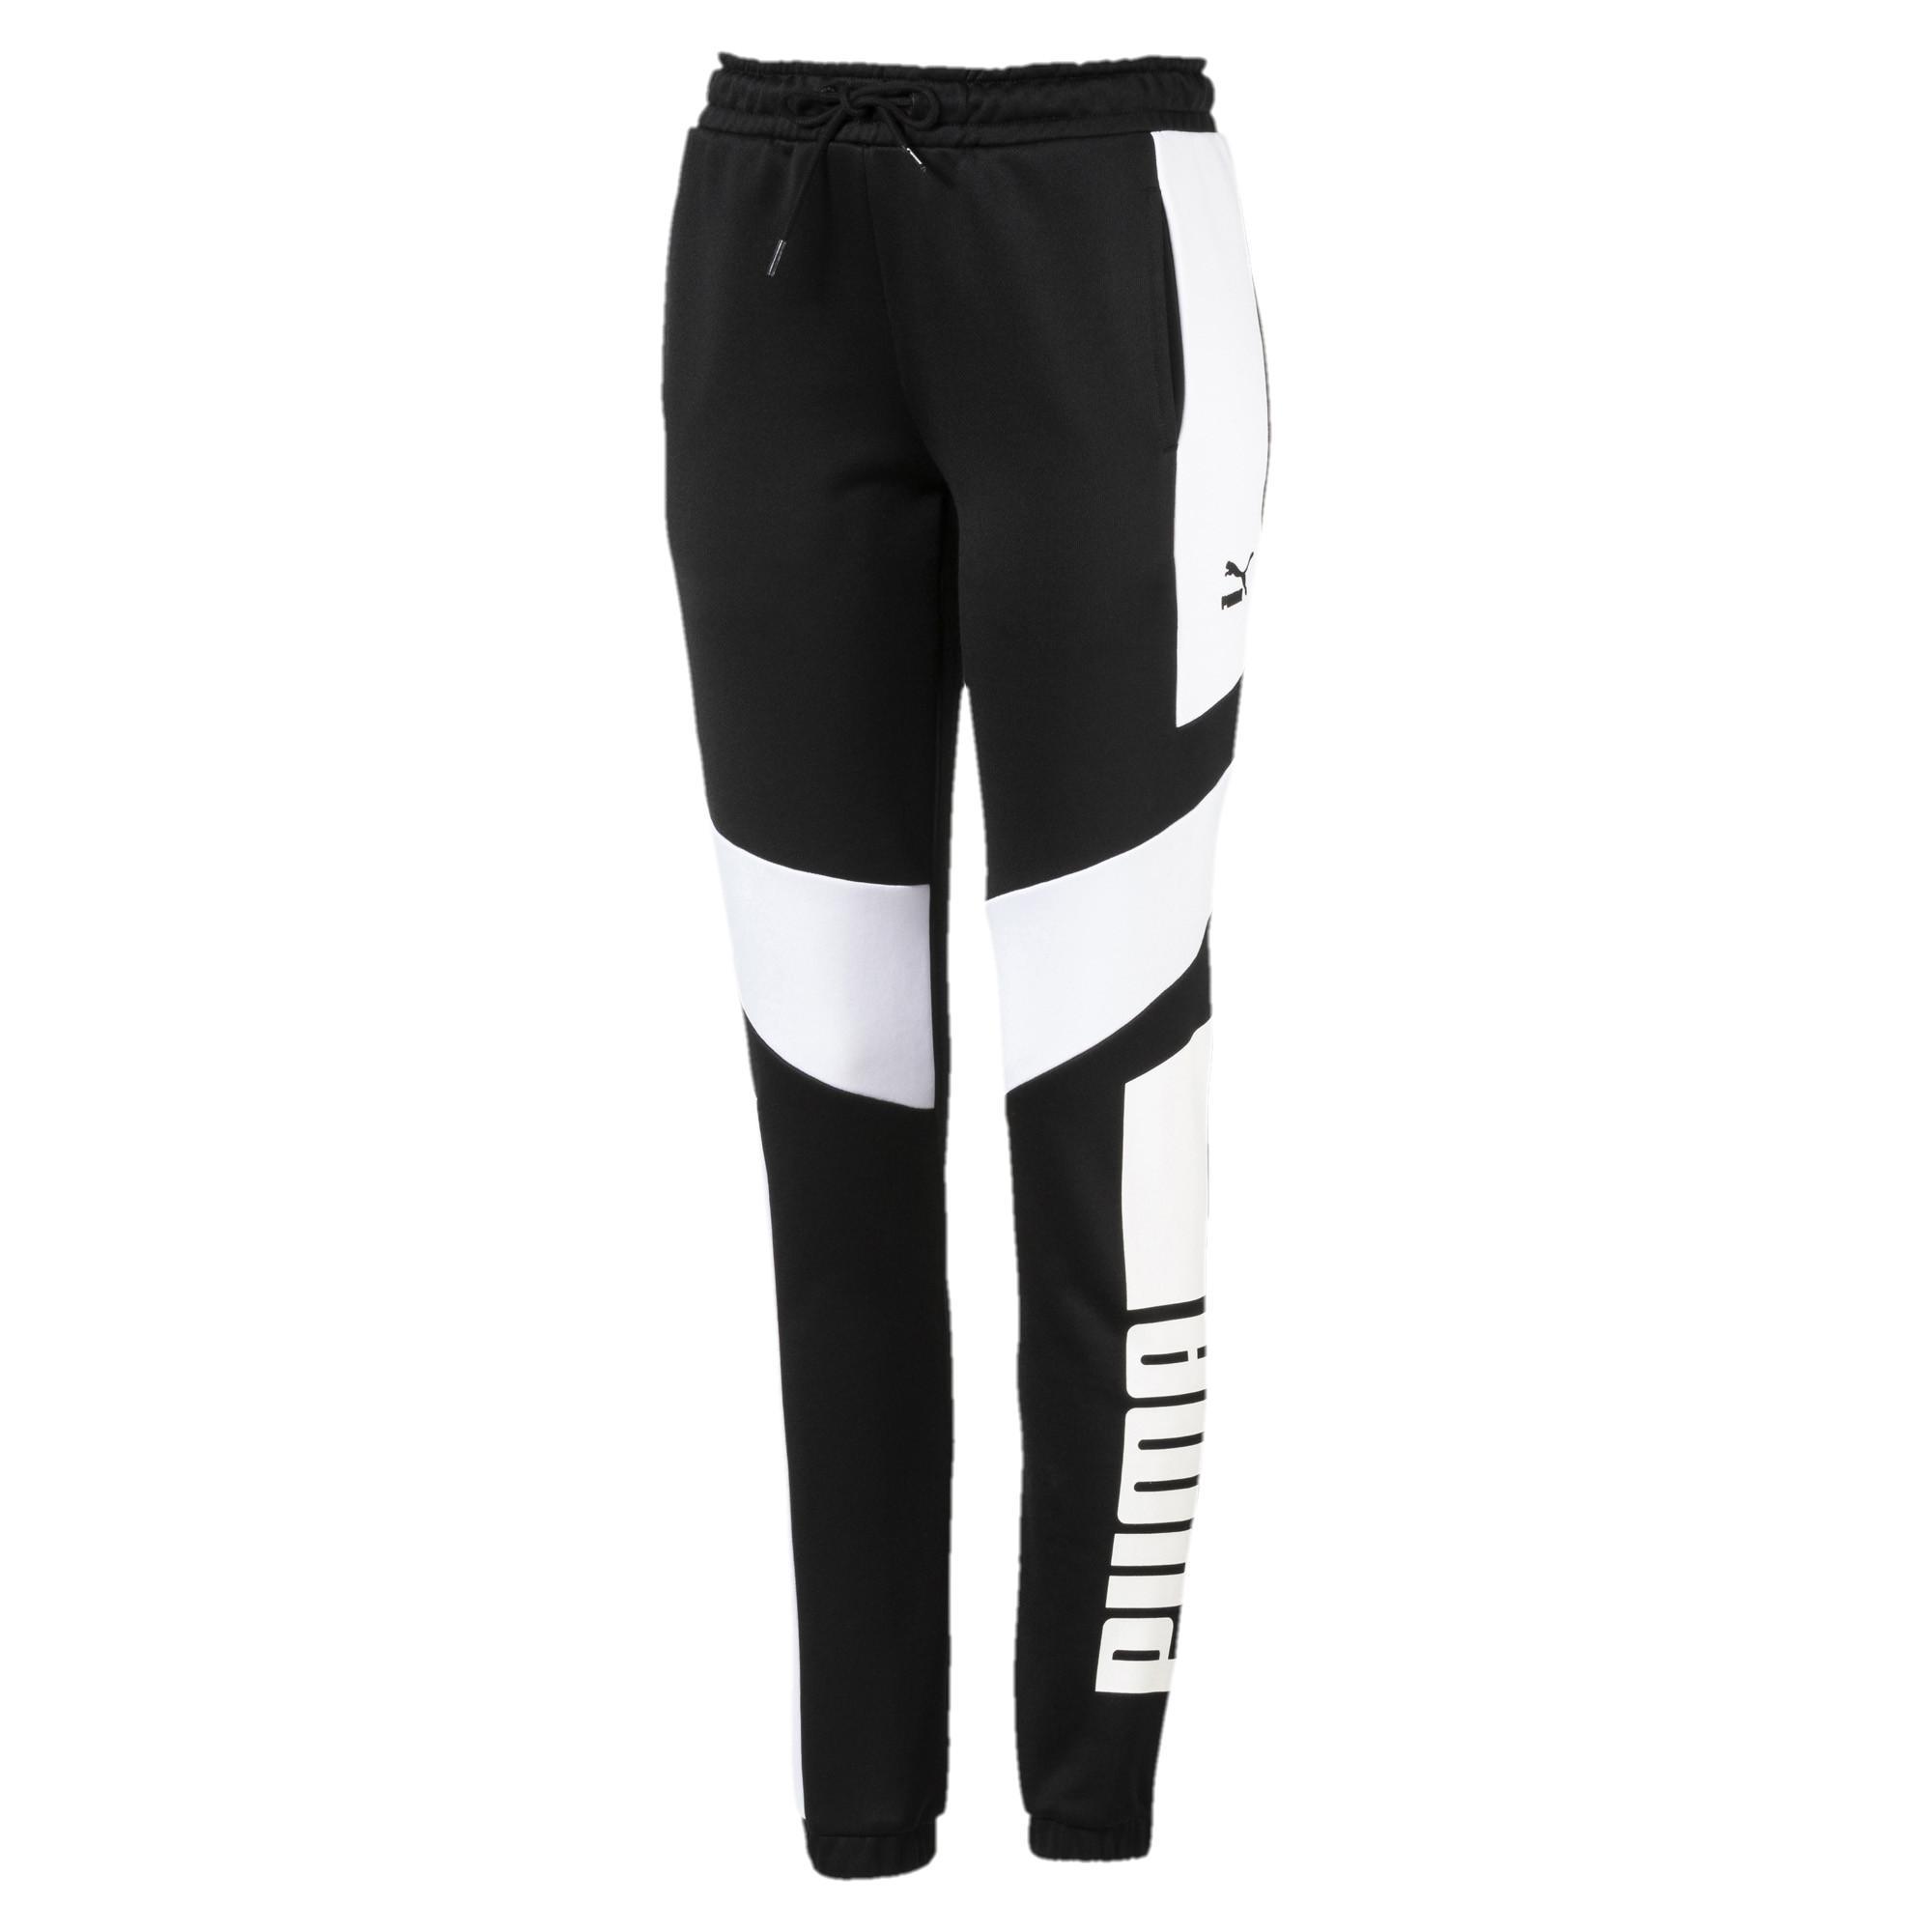 28e8ec0022230 PUMA Archive T7 Women's Pants in Black - Save 40% - Lyst